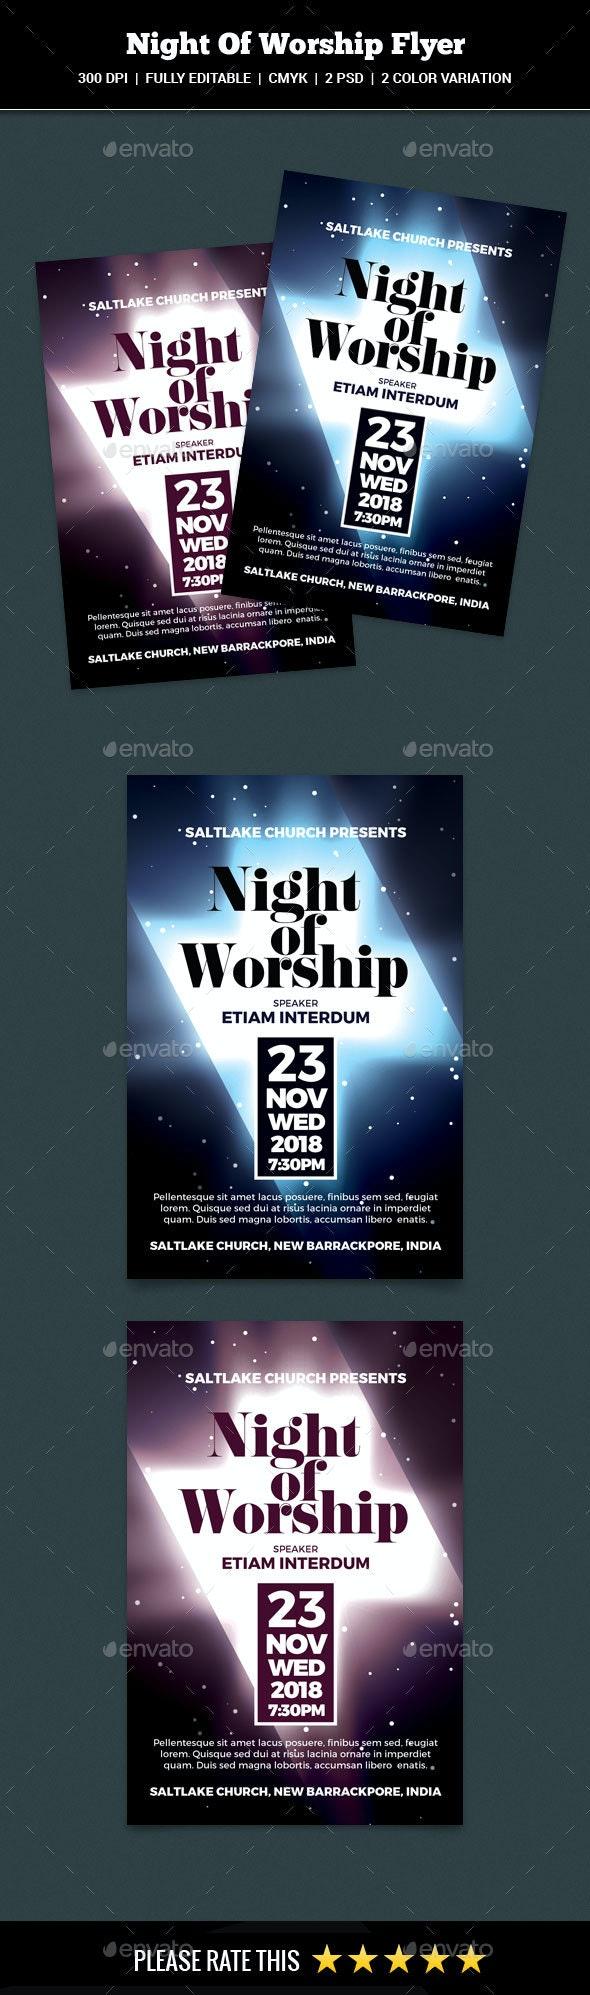 Night Of Worship Flyer - Church Flyers